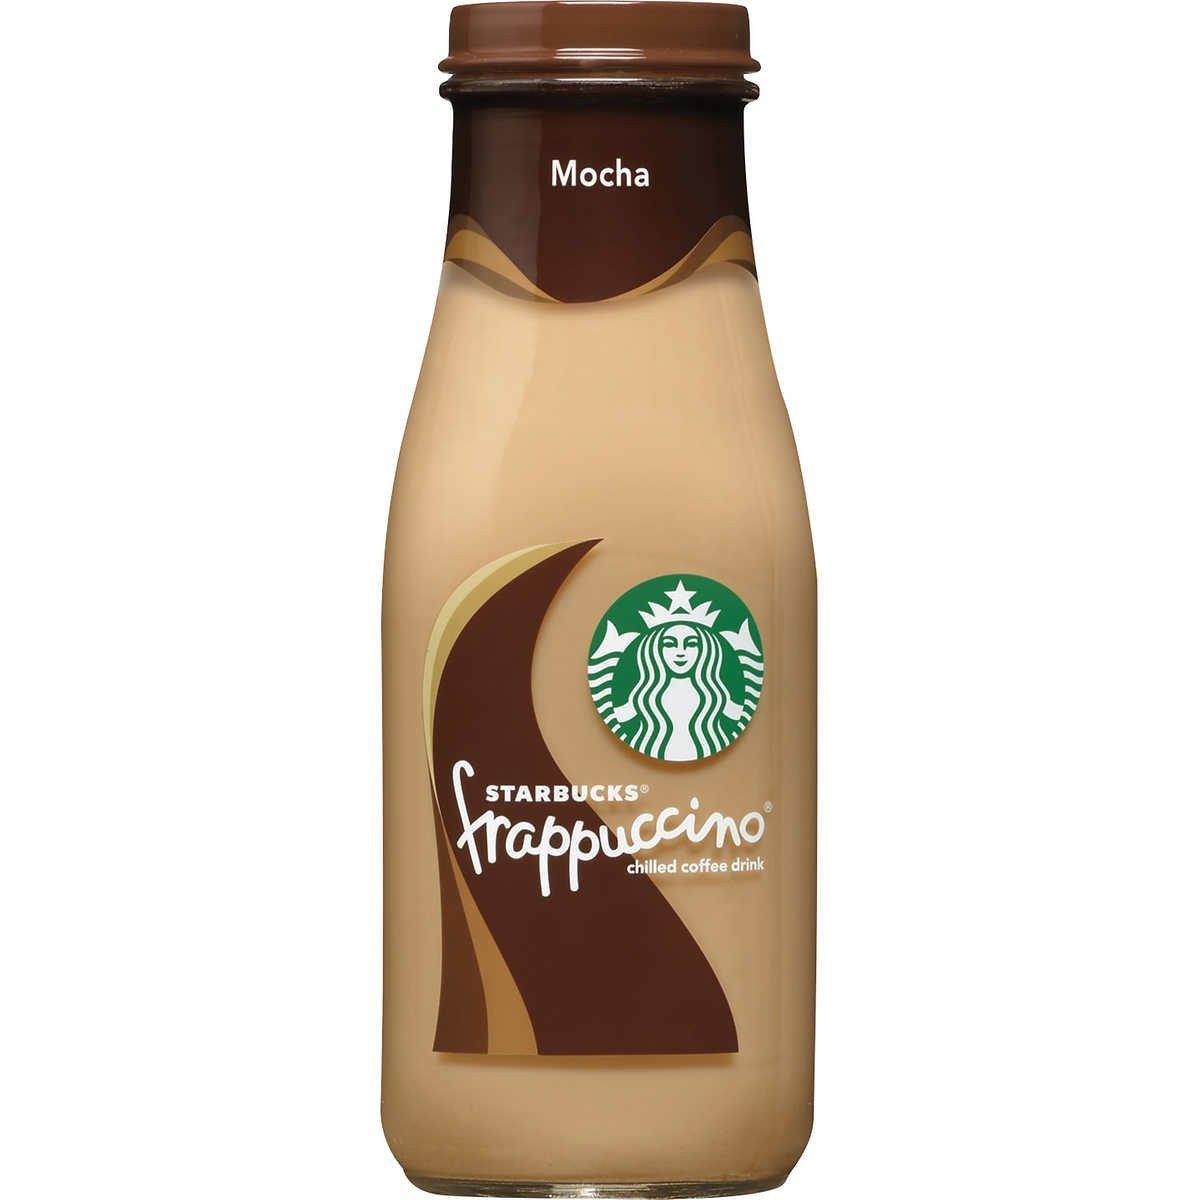 Starbucks Frappuccino Coffee Drink 9.5 oz Glass Bottles (15-Pack) (Mocha)